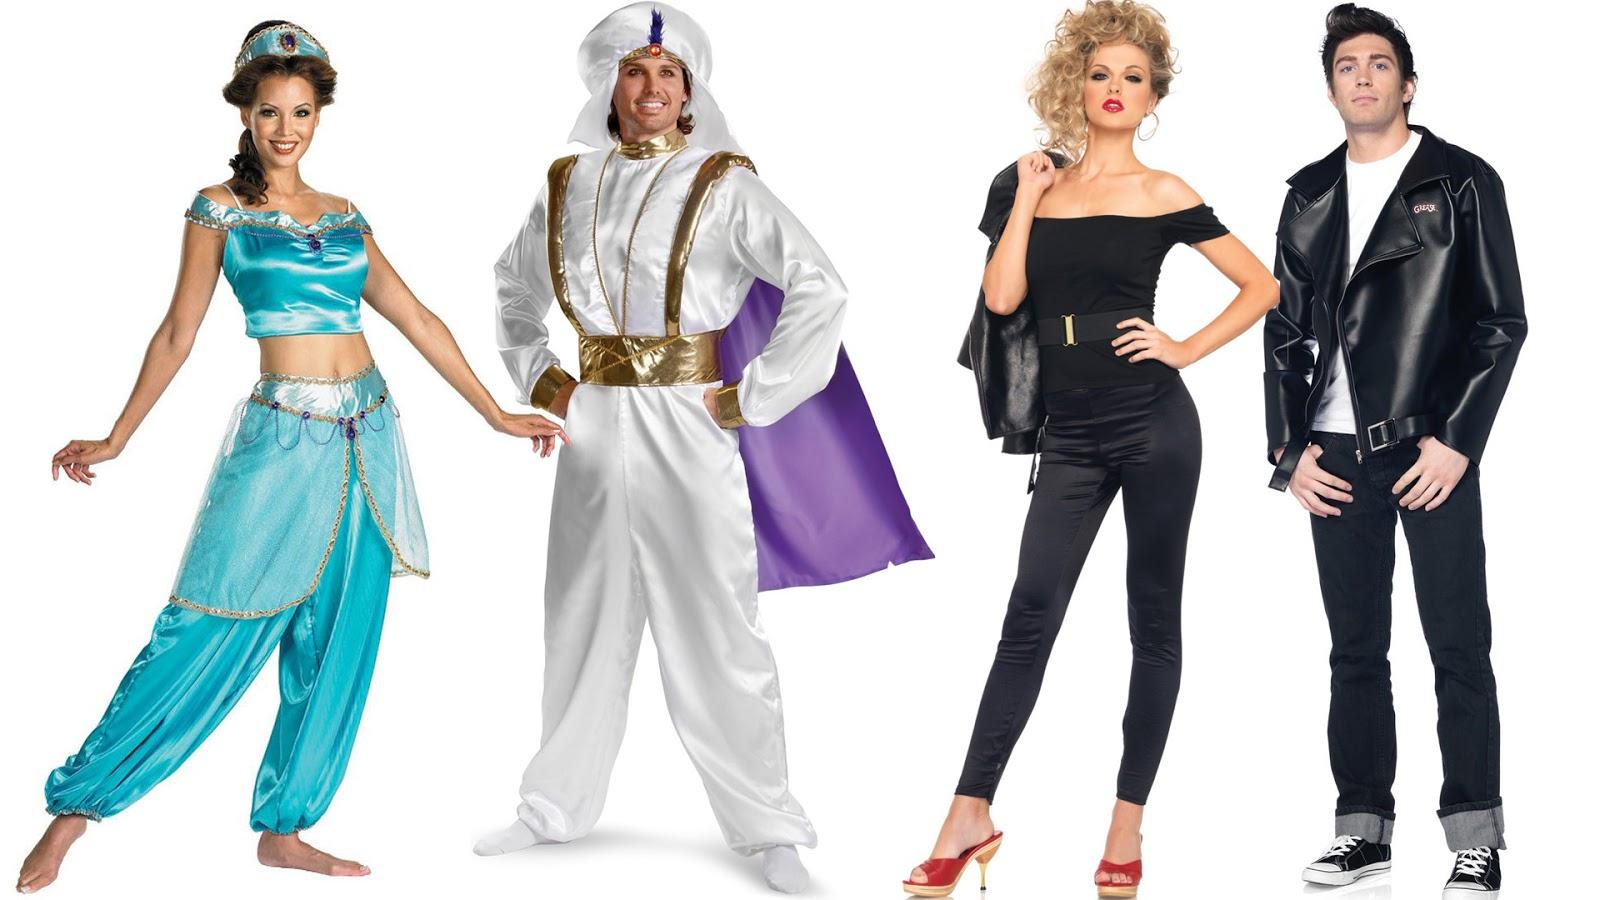 {Best}* Halloween 2017 Costumes Ideas For Men, Women